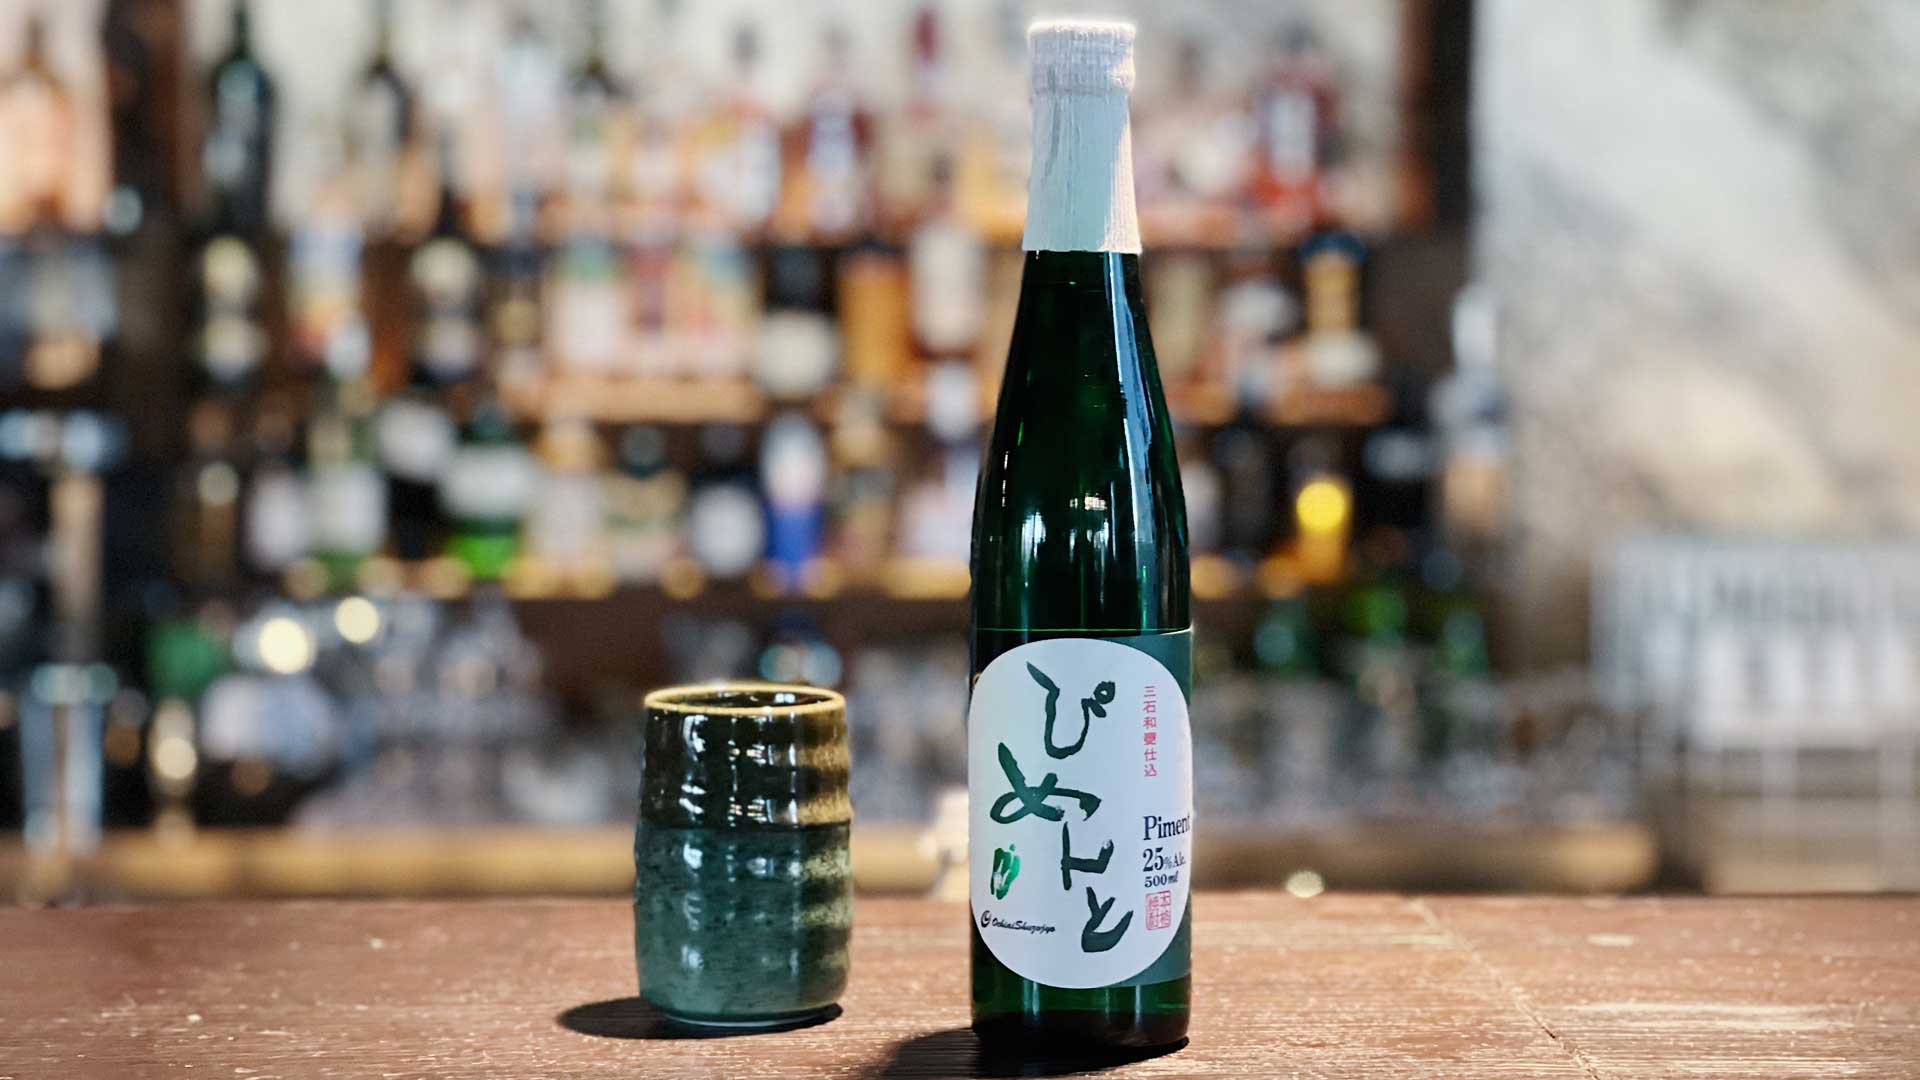 shochu-peperone-verde-super-gin-piment-ochiai-Coqtail-Milano